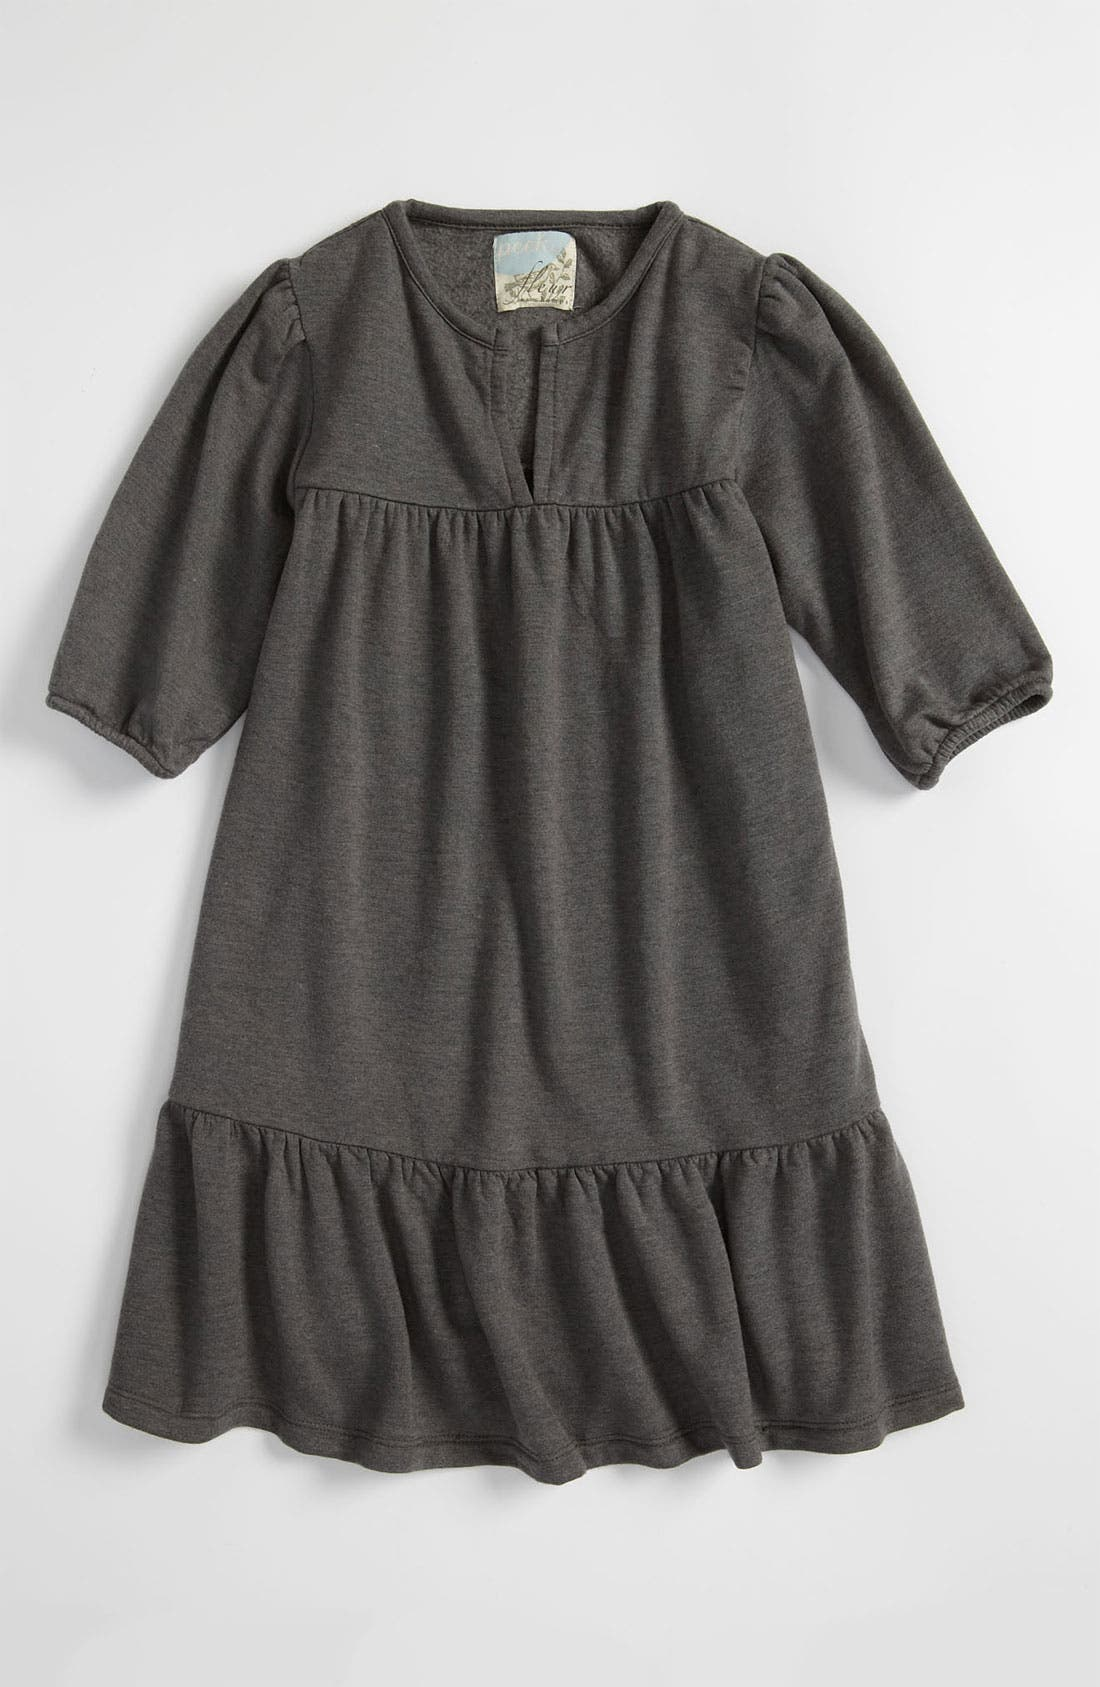 Alternate Image 1 Selected - Peek 'Eliza' Dress (Toddler, Little Girls & Big Girls)